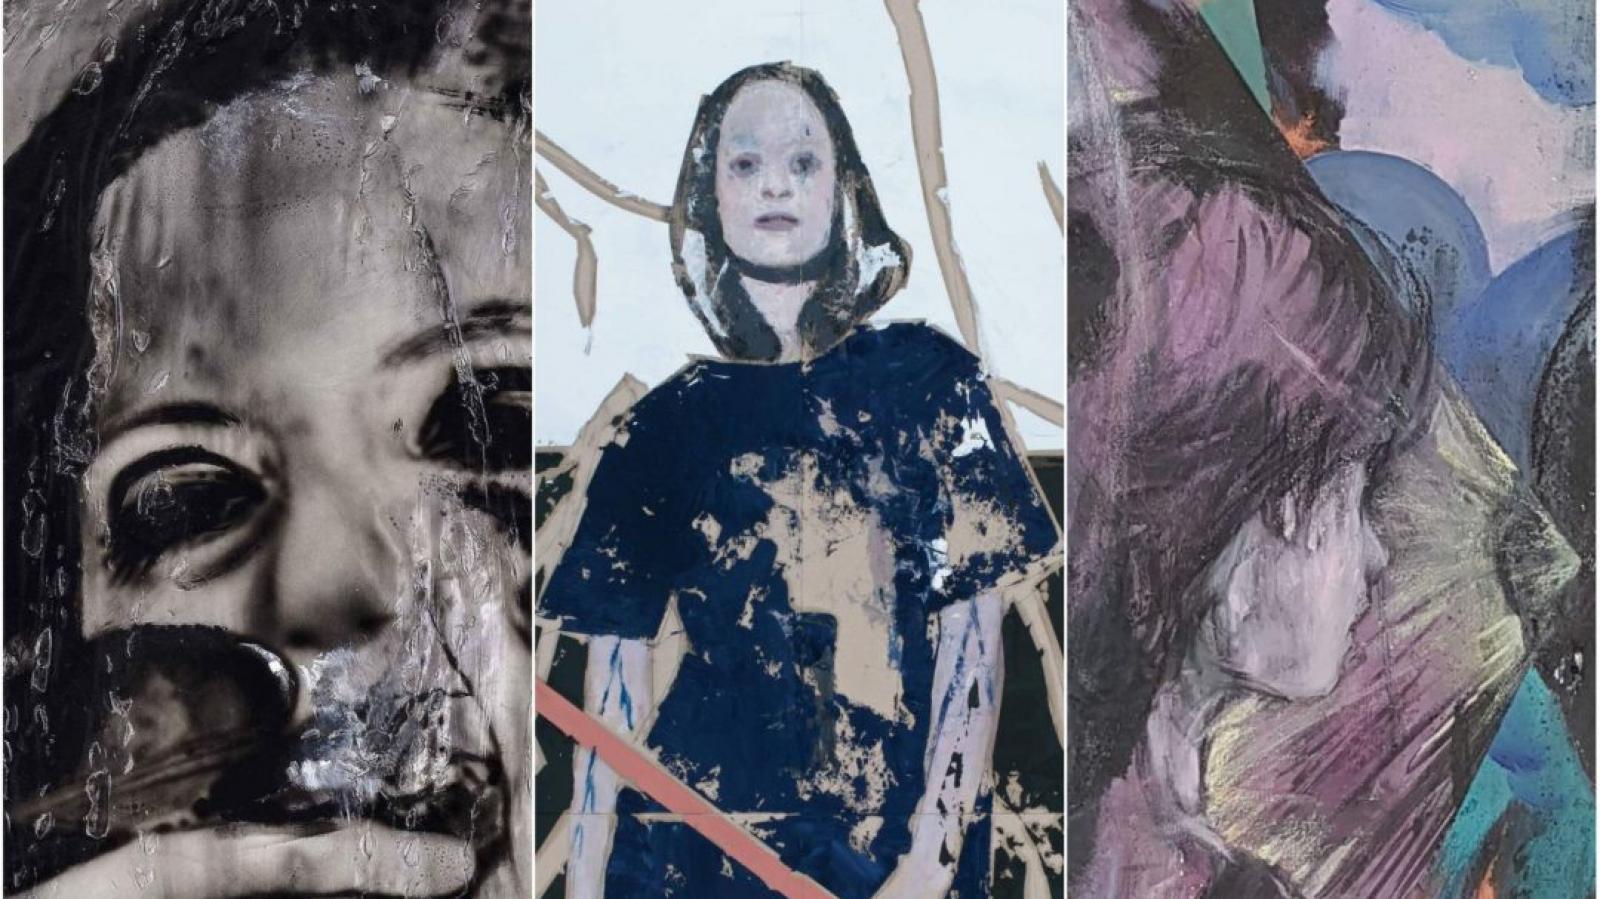 Z výstavy: Josef Bolf, Martin Gerboc, Alexander Tine: Skin/Kůže (DSC Gallery)